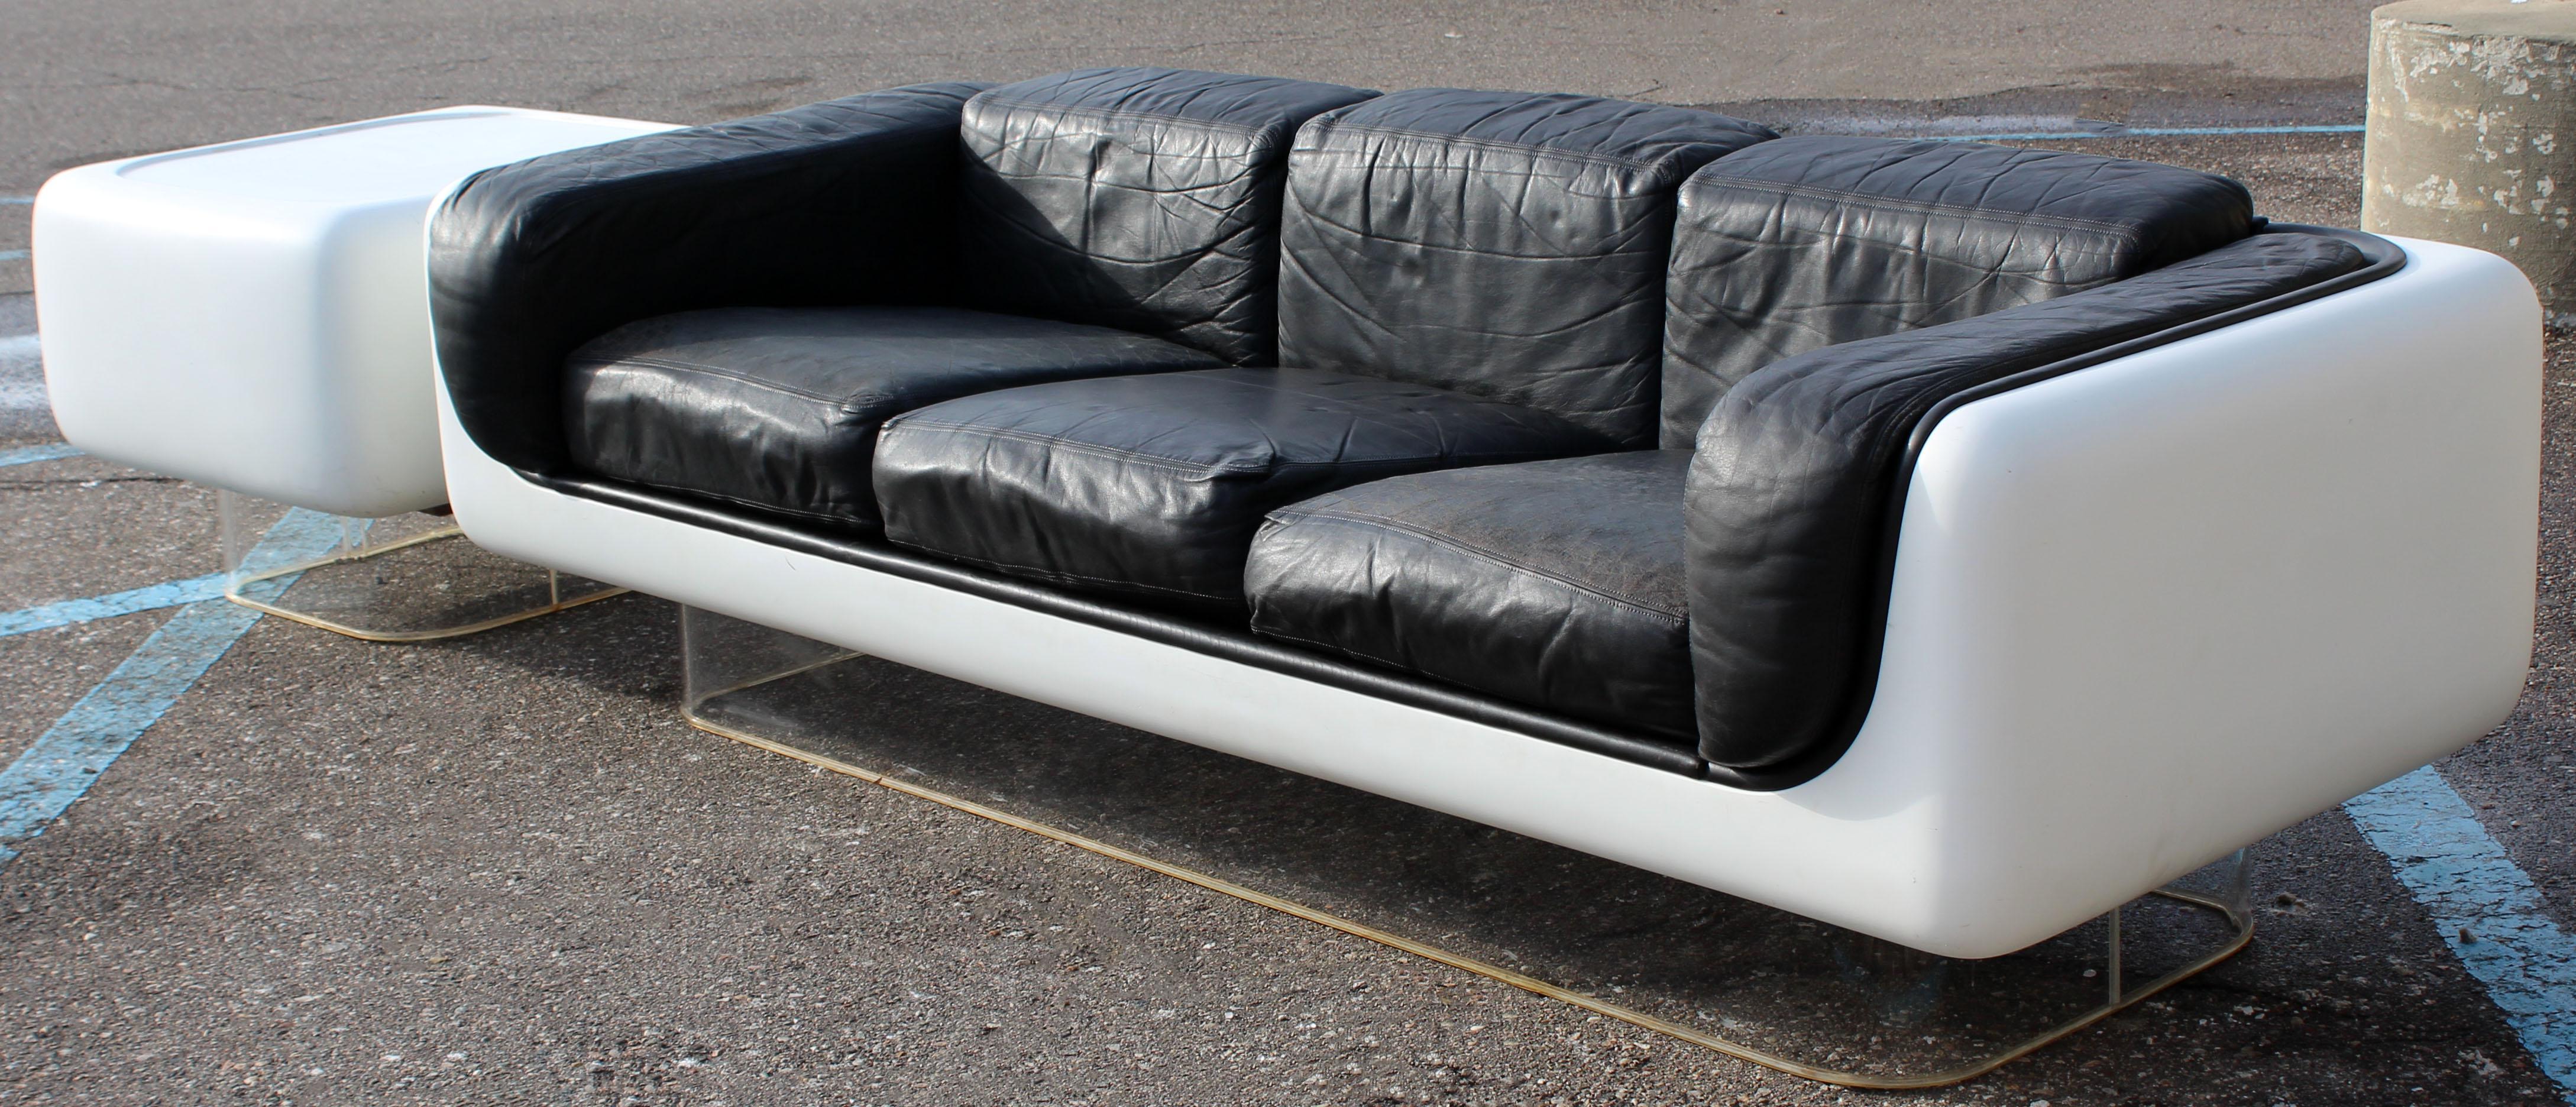 steelcase sofa platner ikea rp embly luxury mid century modern warren fiberglass lucite acrylic end table for sale